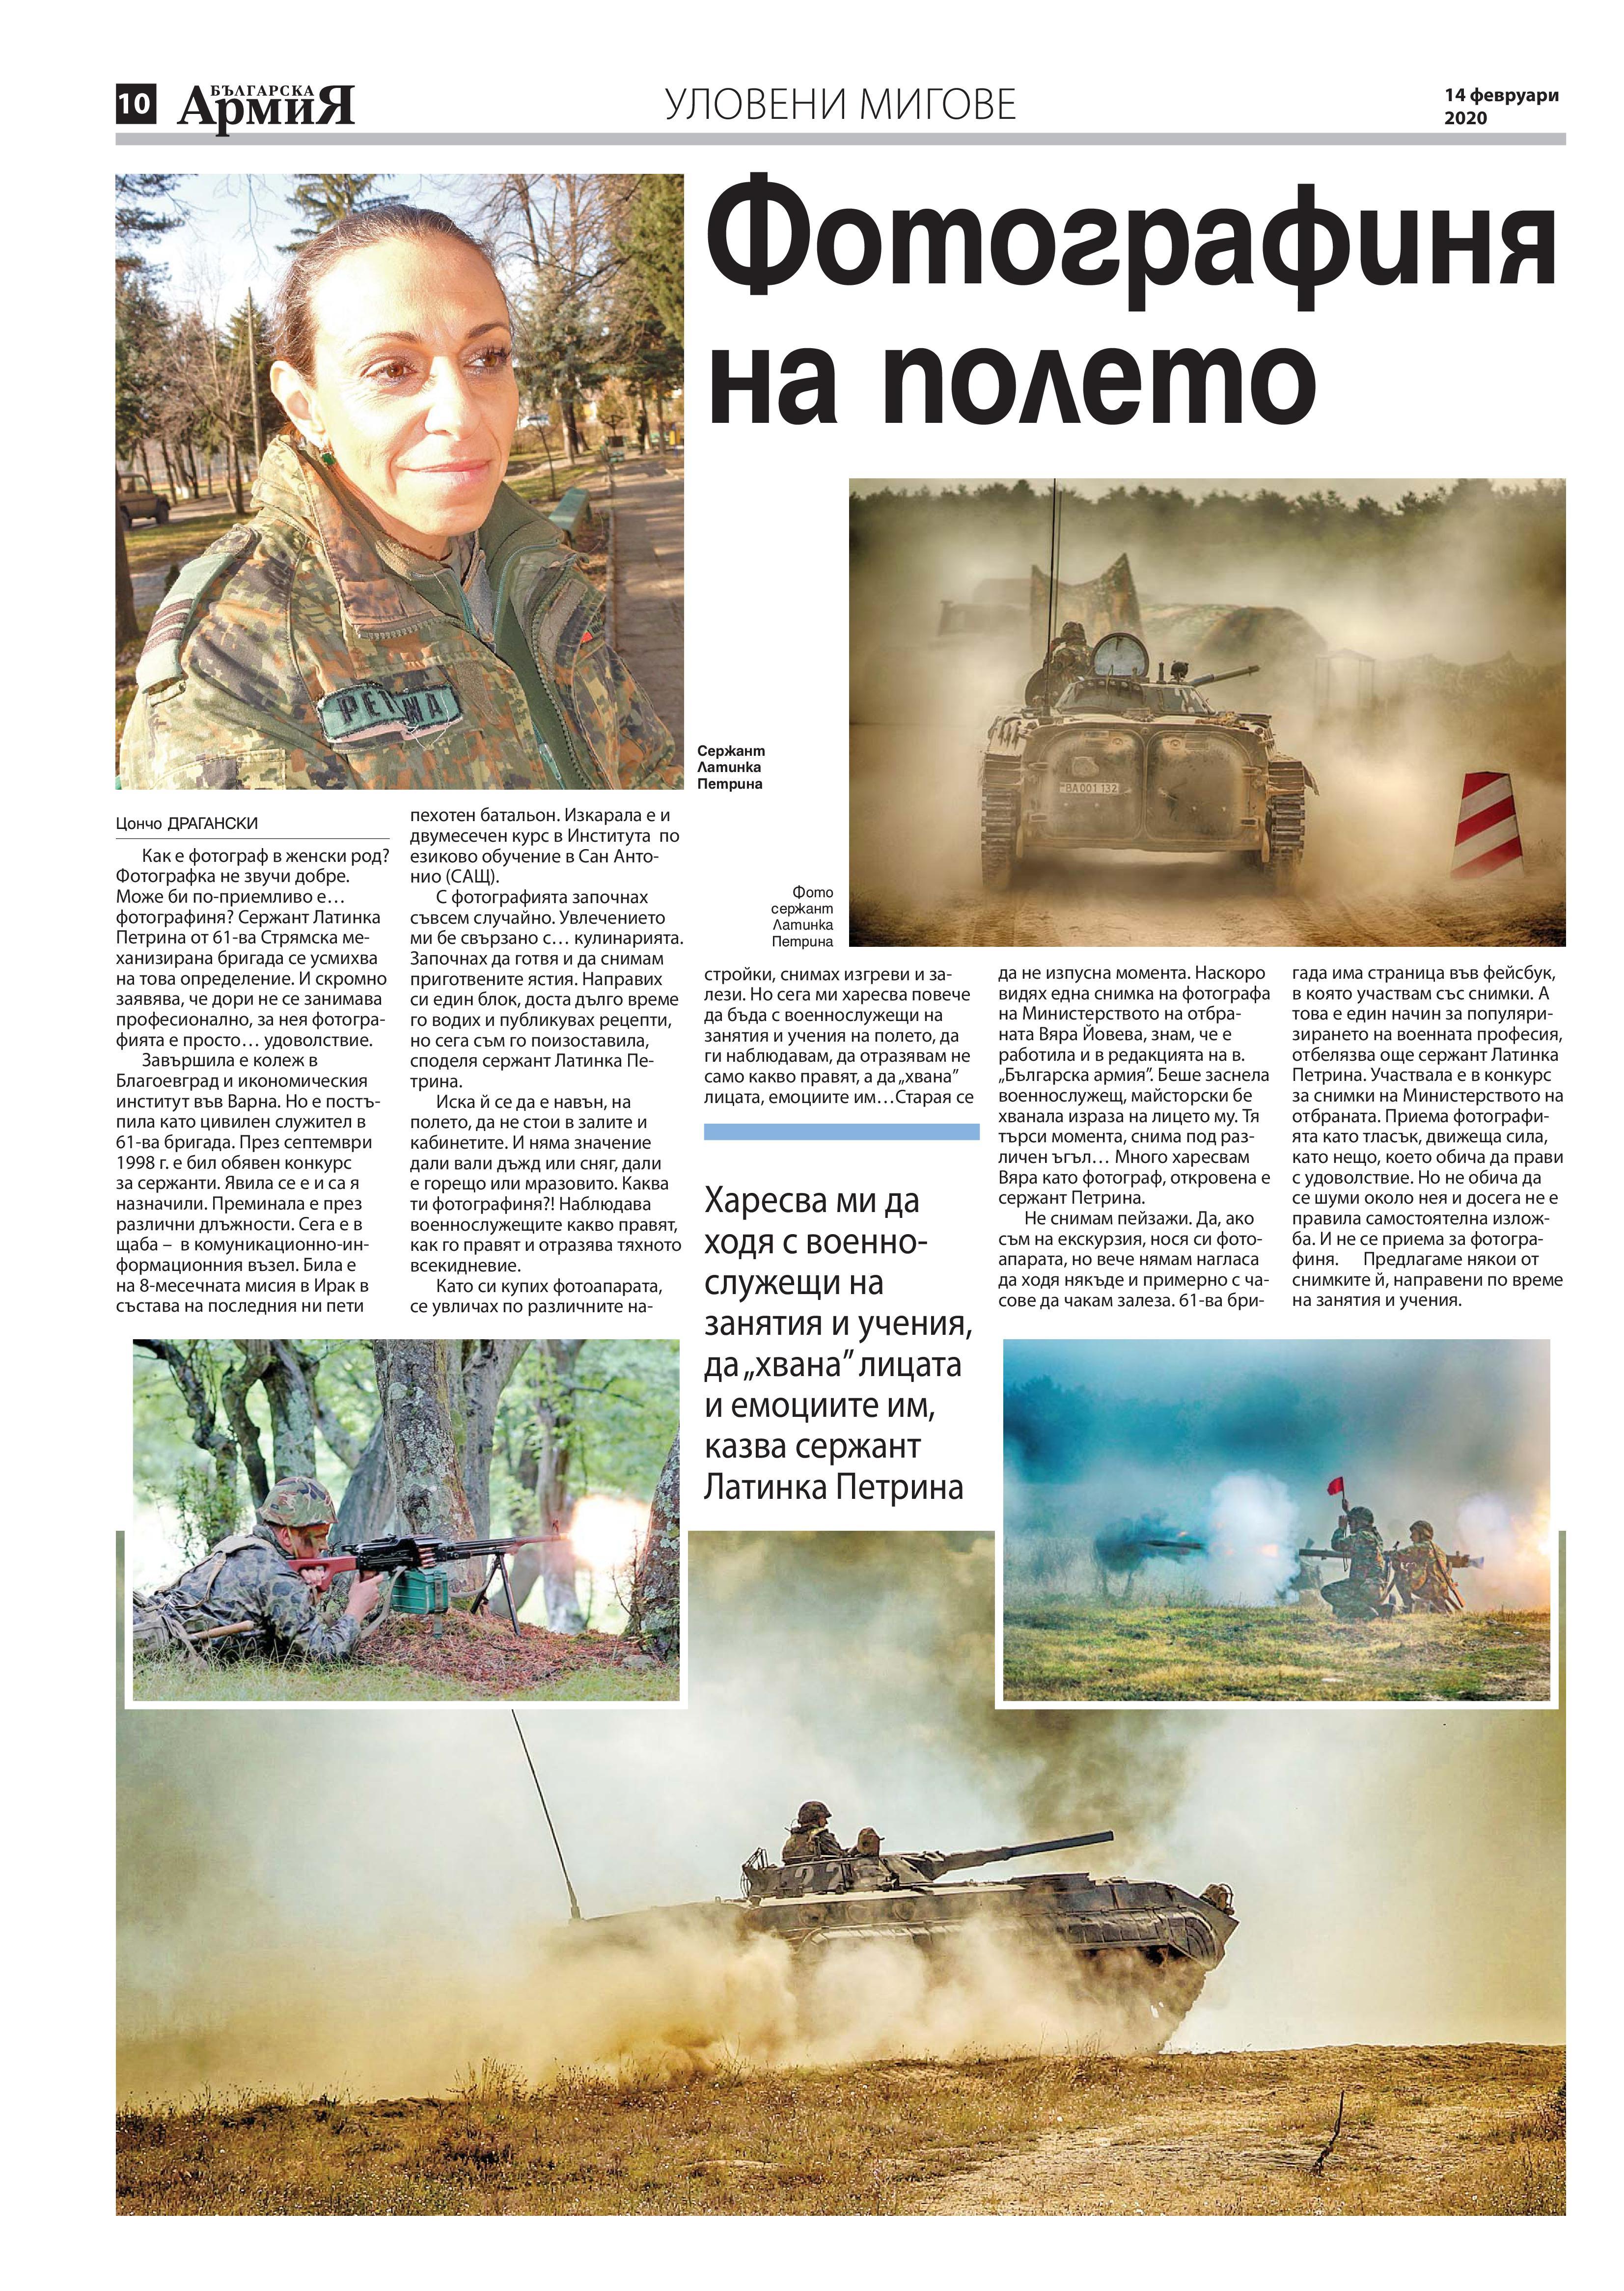 https://www.armymedia.bg/wp-content/uploads/2015/06/10-35.jpg